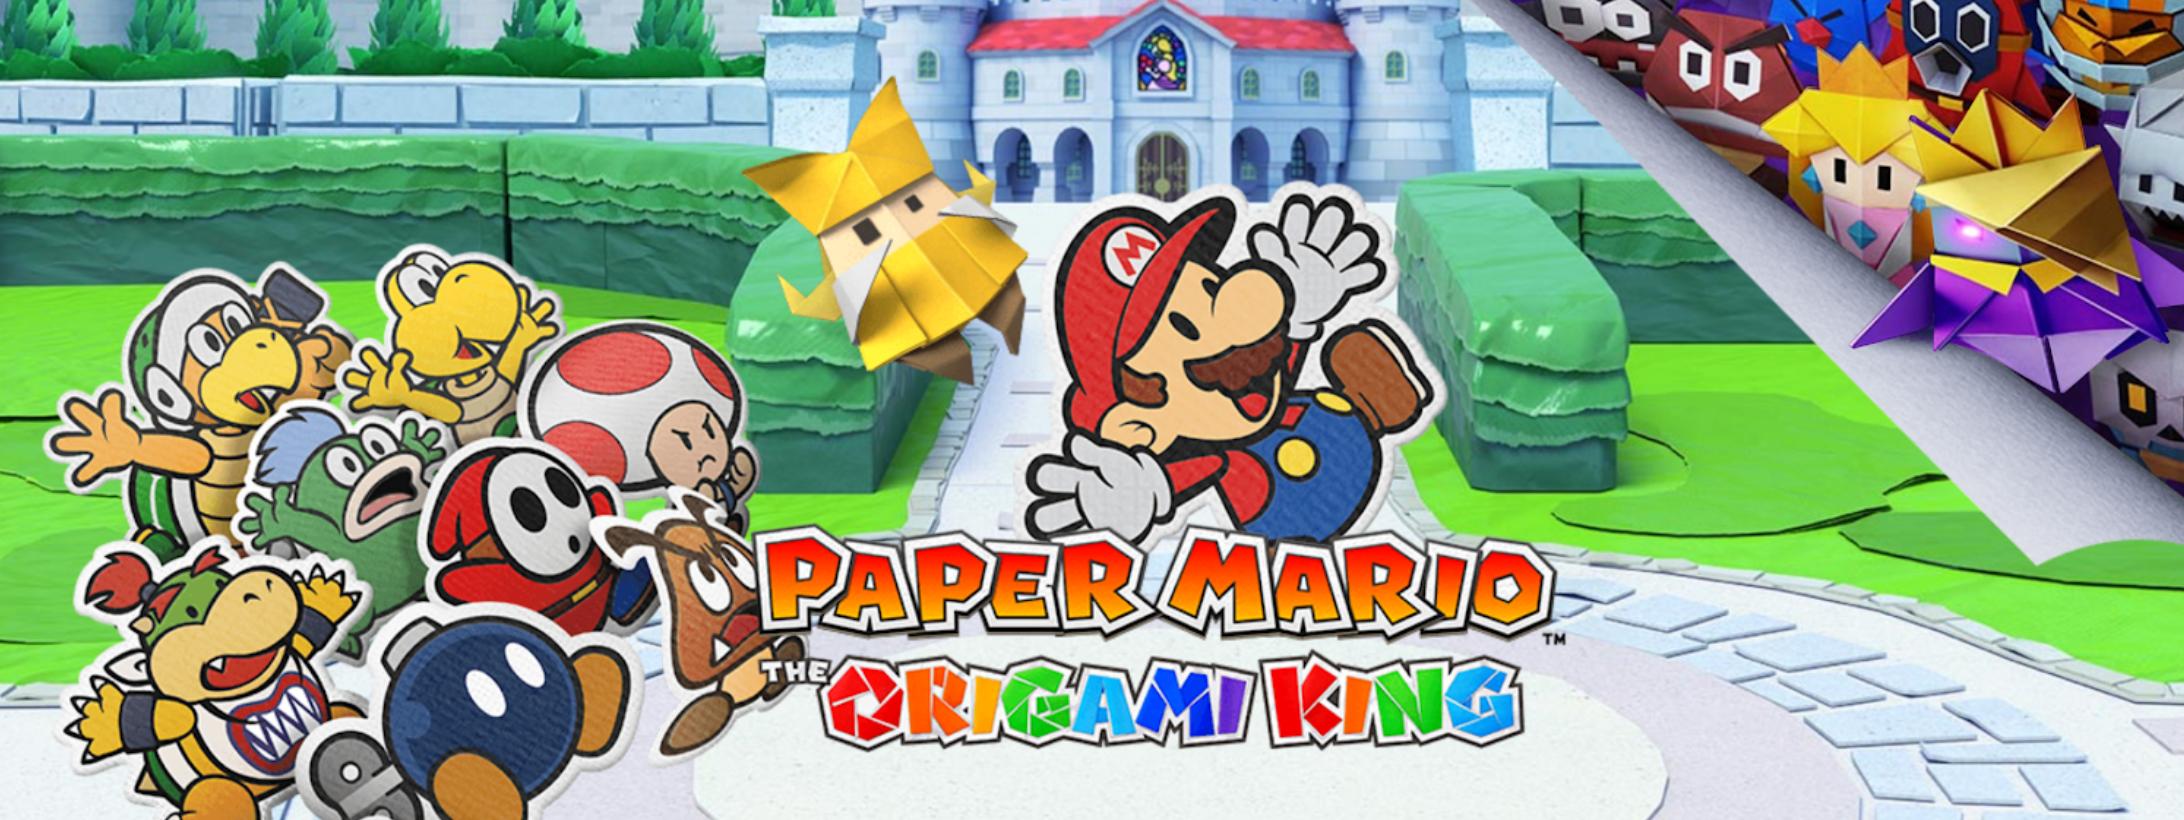 Universal Design and Paper Mario